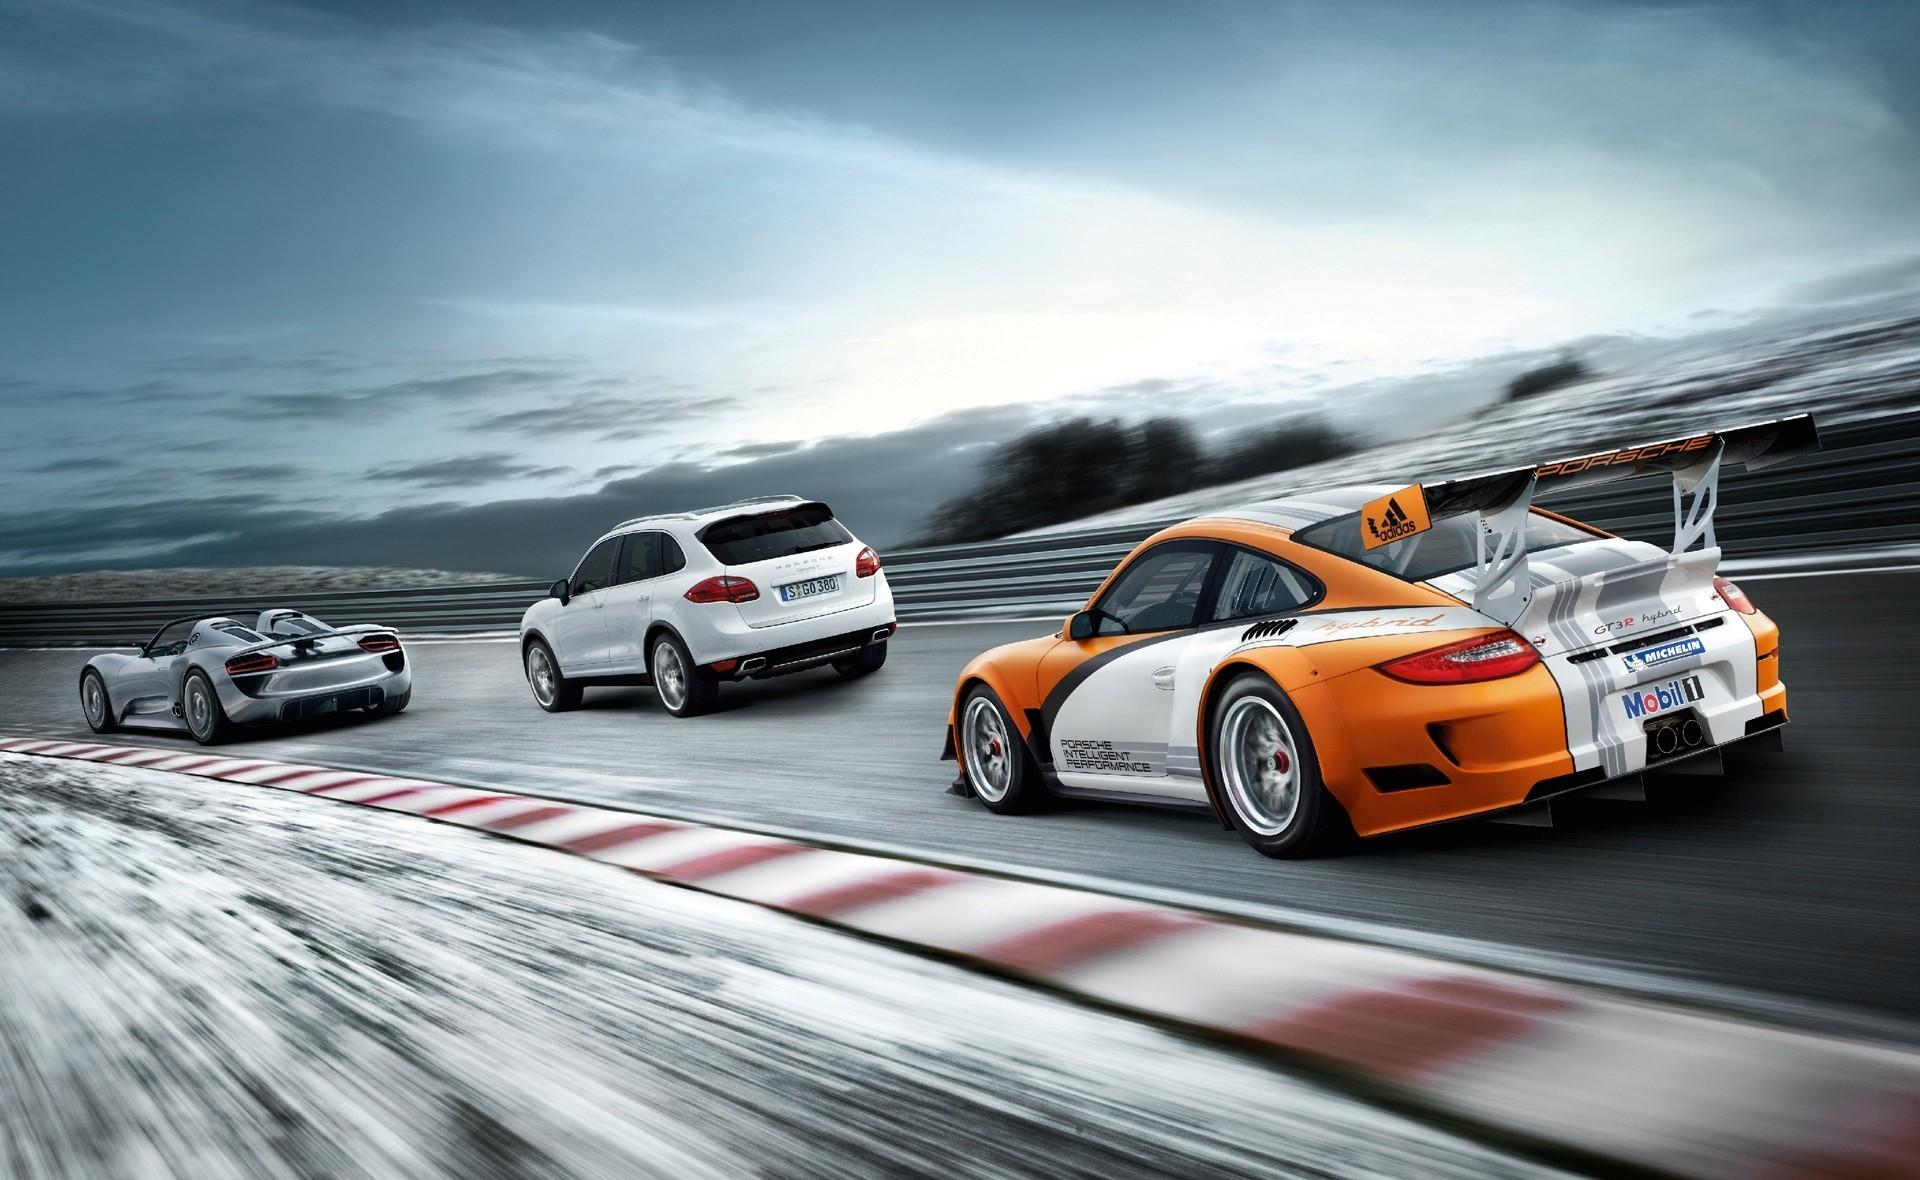 car-vehicle-Porsche-Audi-sports-car-racing-race-tracks-Porsche-911-GT3-driving-performance-car-Porsche-918-Spyder-Porsche-Cayenne-wheel-supercar-land-vehicle-automotive-design-automobile-make-luxury-vehicle-auto-racing-107191 Interesting Hinh Anh Xe Porsche 918 Spyder Cars Trend